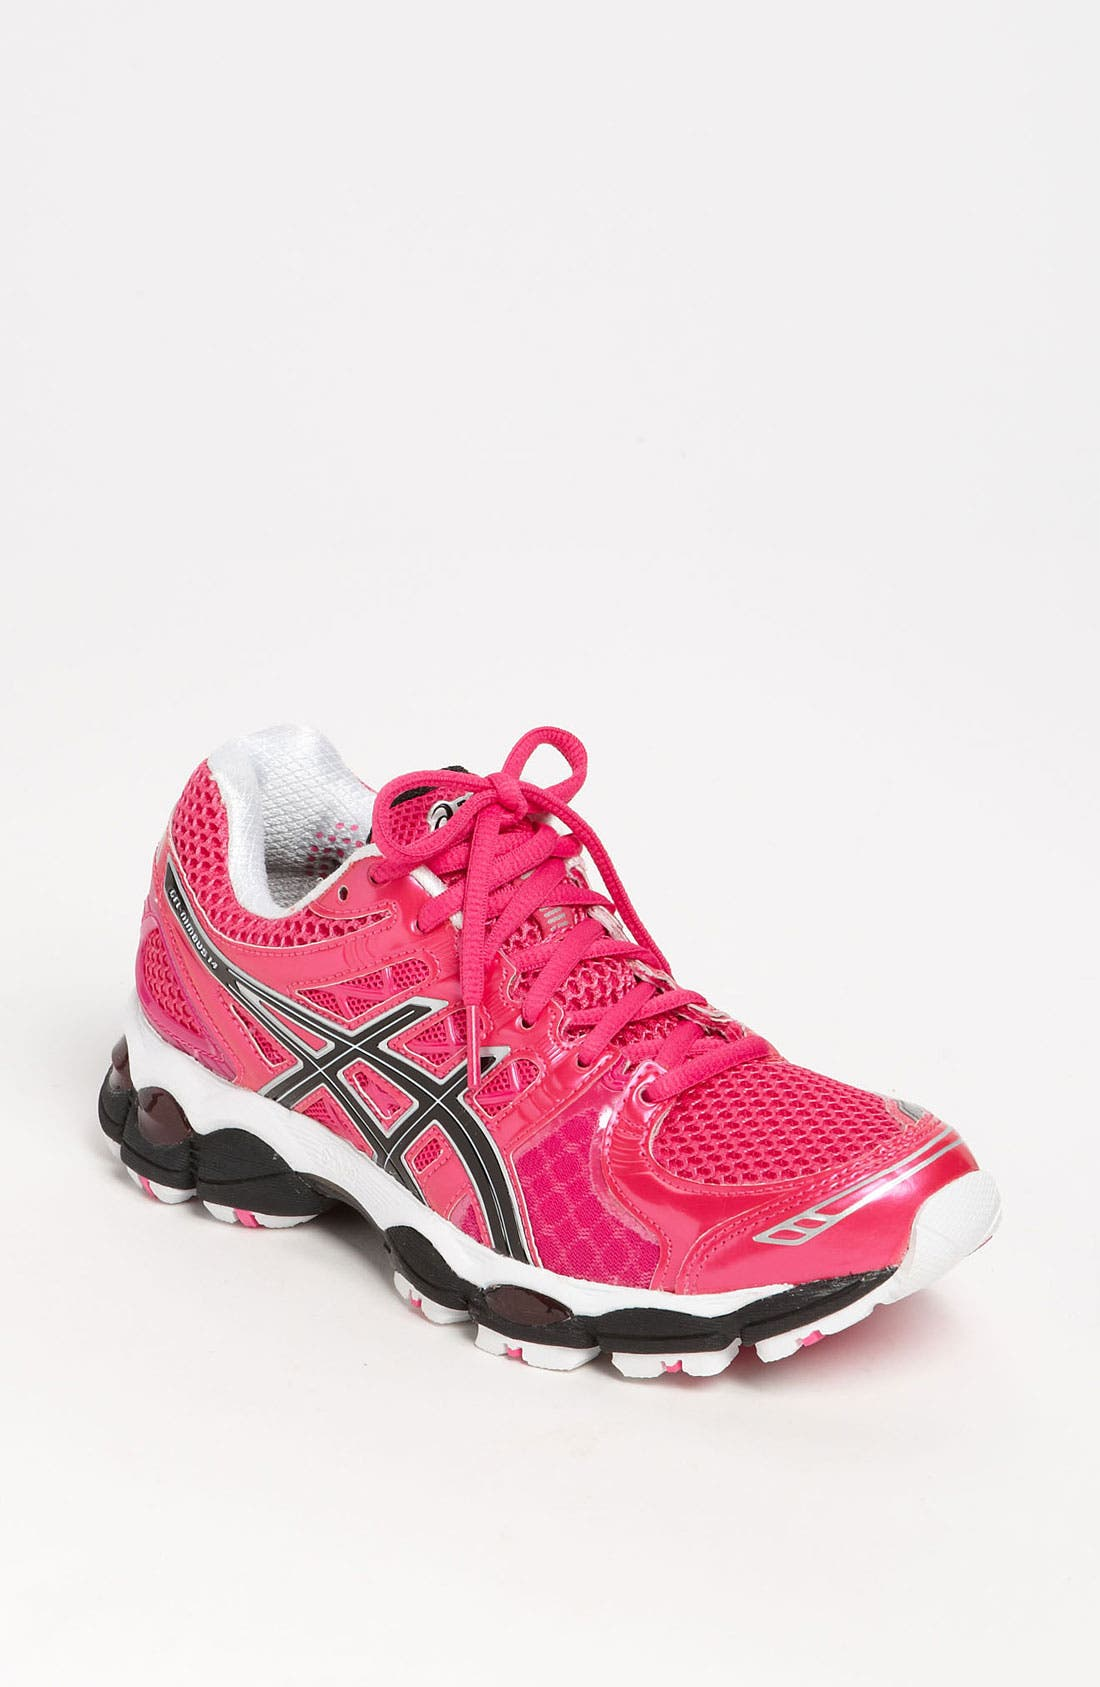 Main Image - ASICS� \u0027GEL-Nimbus 14\u0027 Running Shoe (Women)